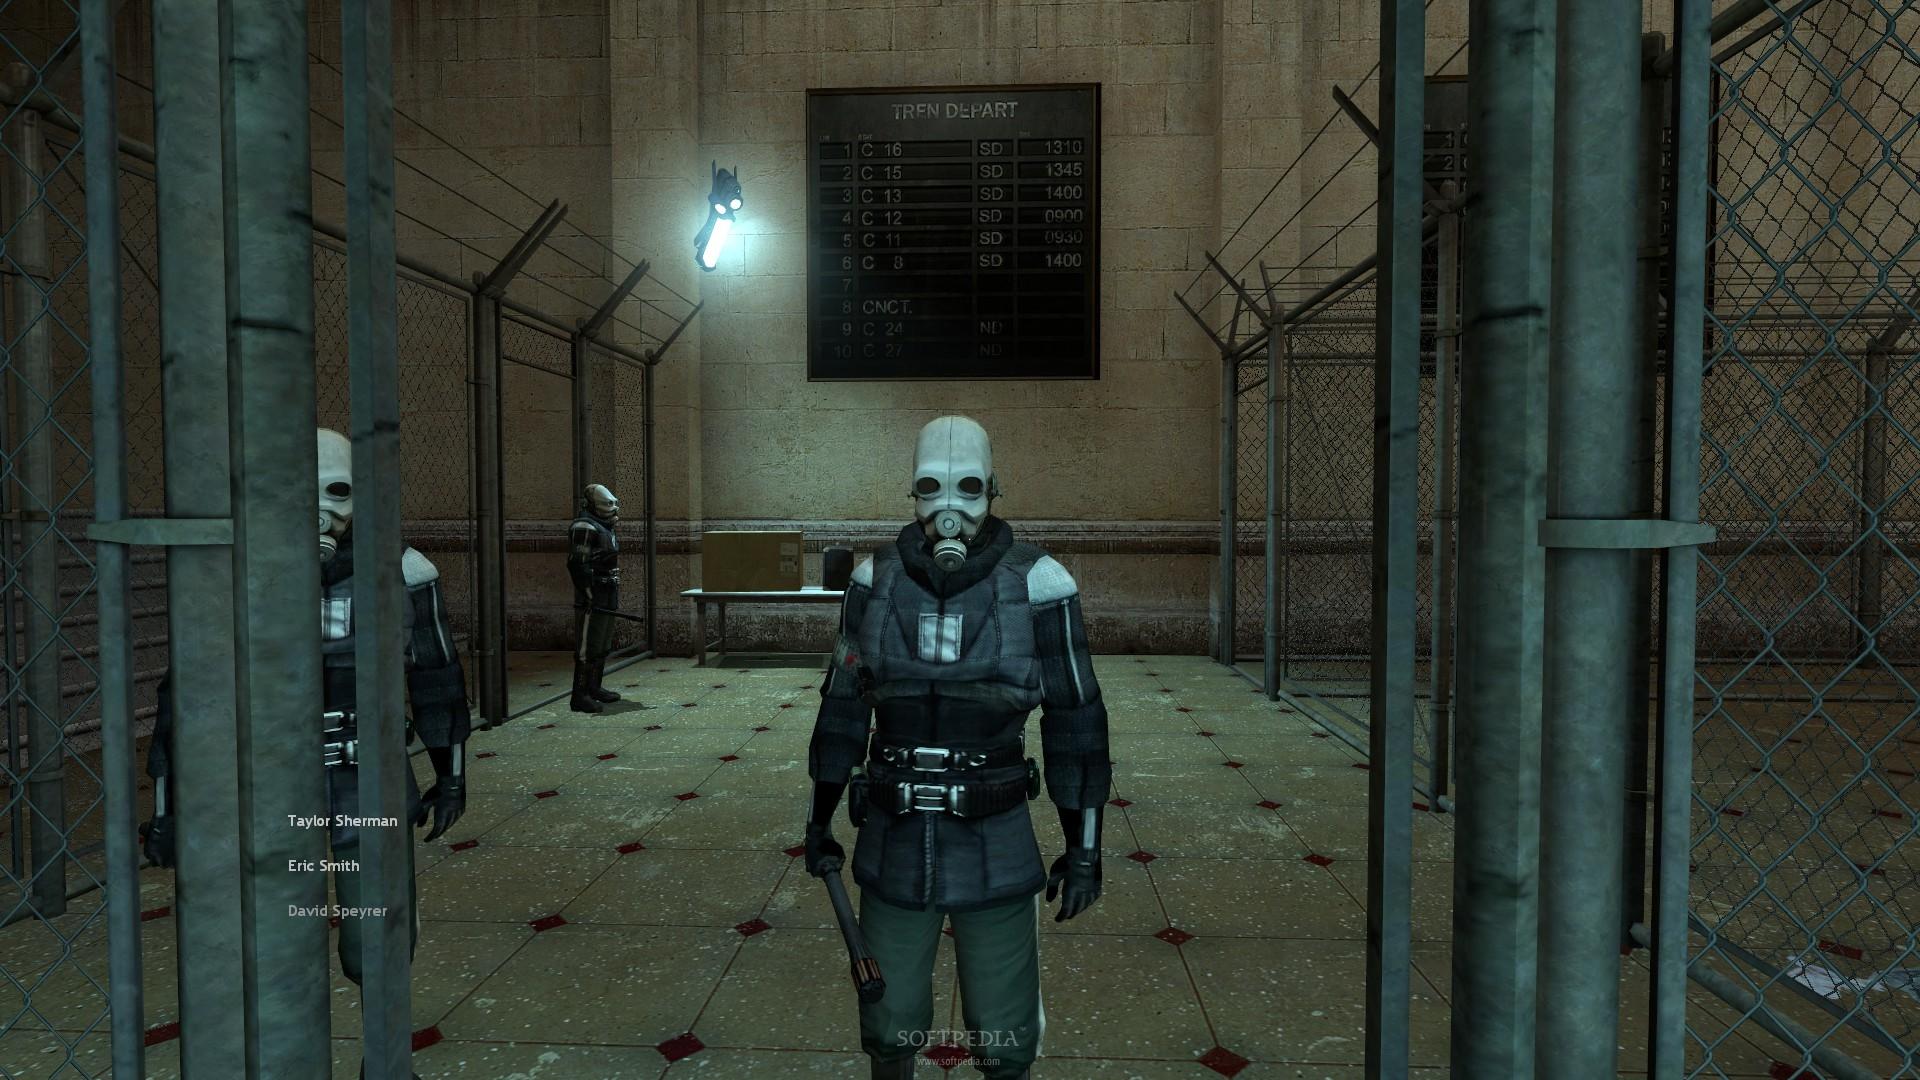 Half life 2 free download full version pc | Half Life 2 Game